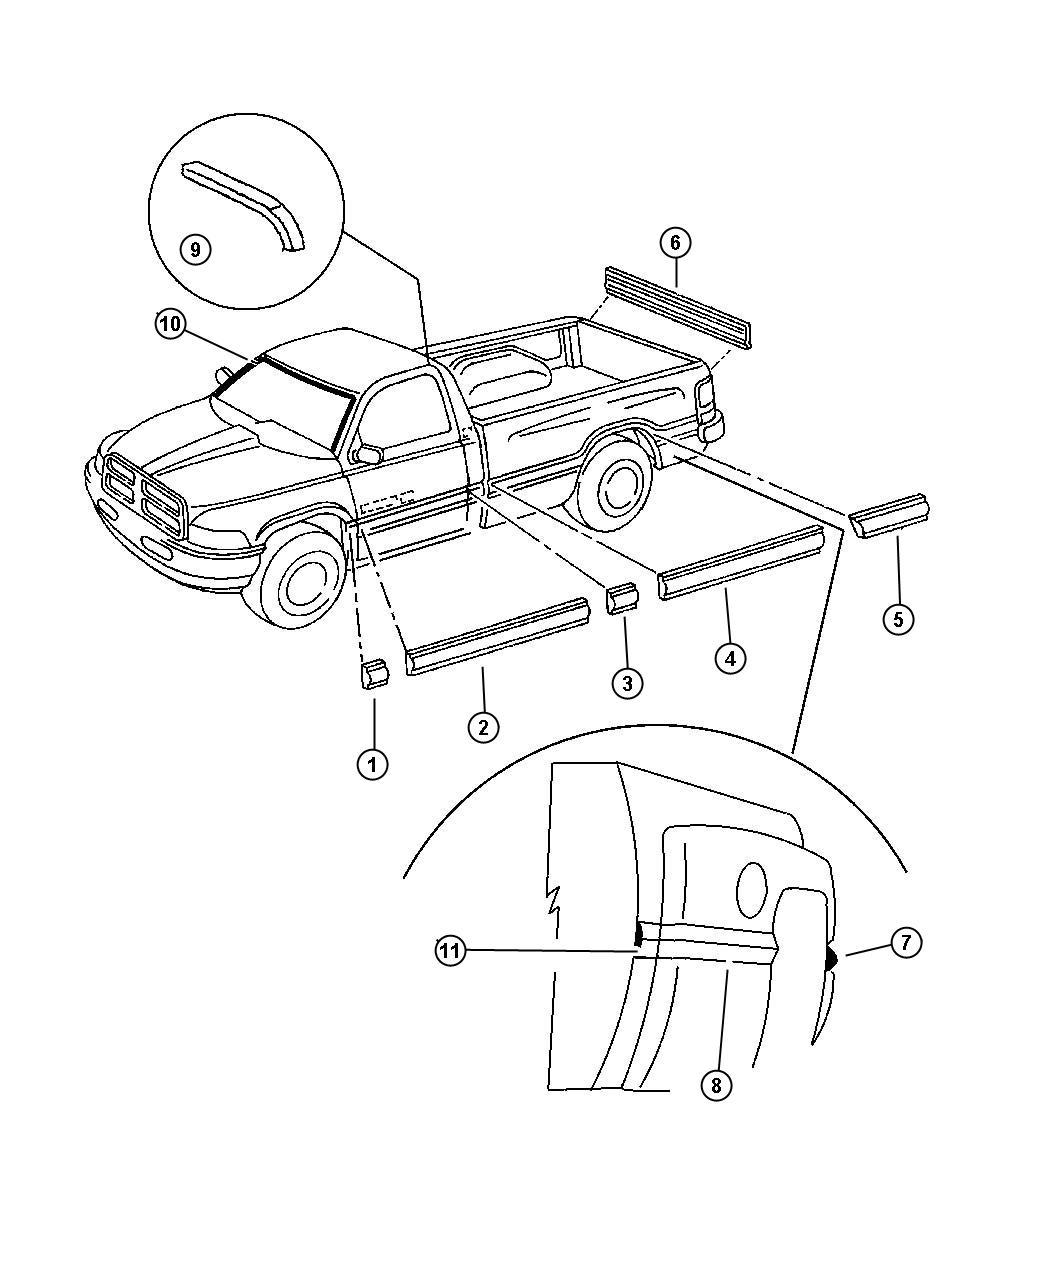 Dodge Ram Applique Tailgate Grouplique Tailgepic